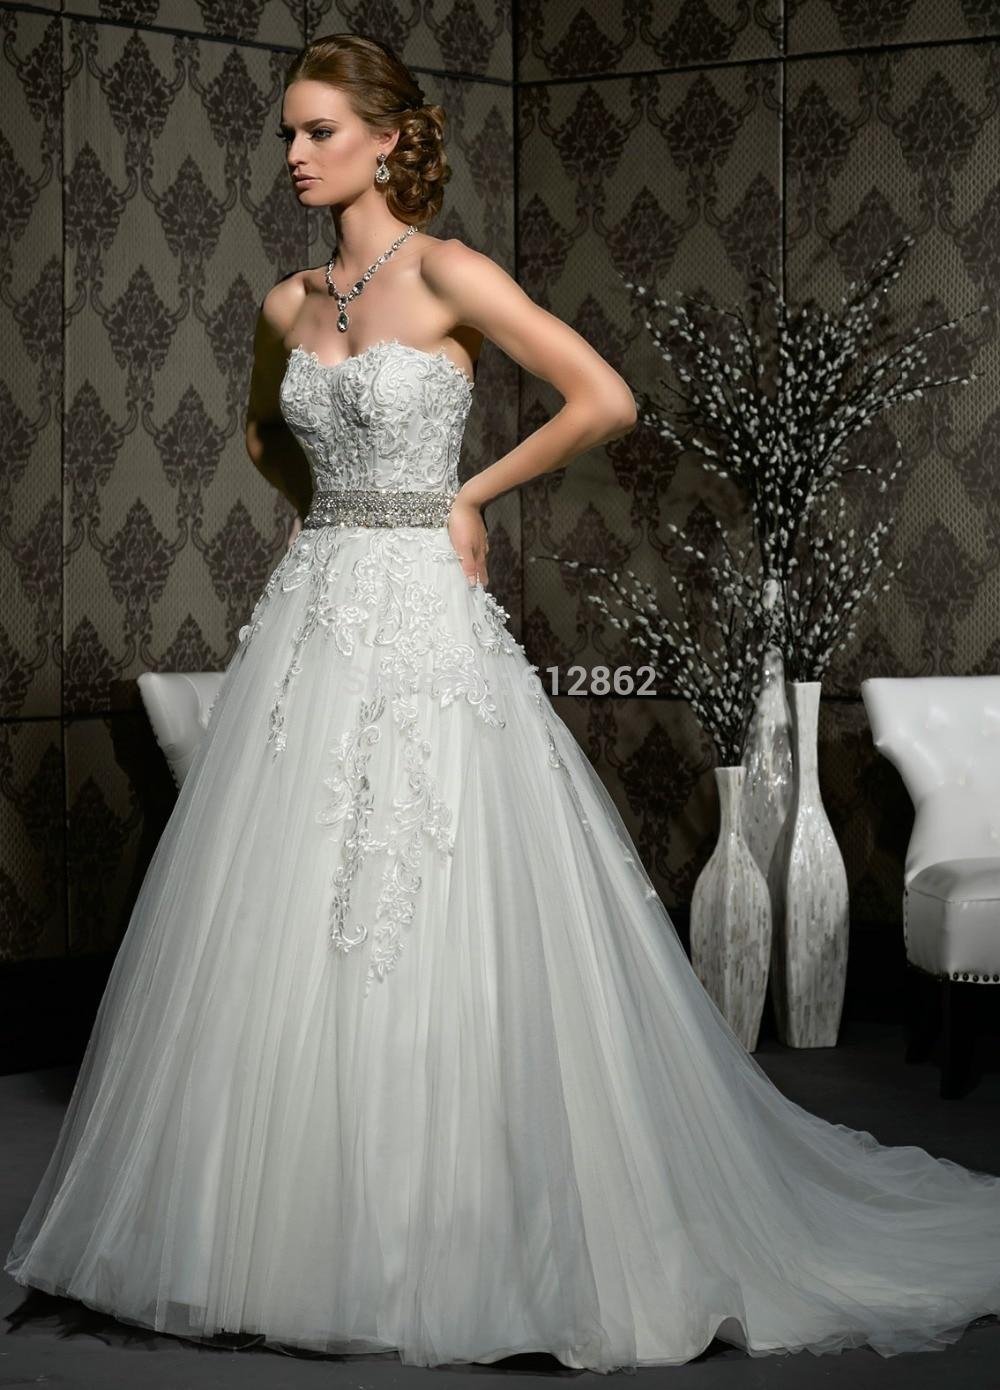 a dress silhouette princess style wedding dresses Cap Sleeved Princess Cut Beaded Satin Wedding Gown